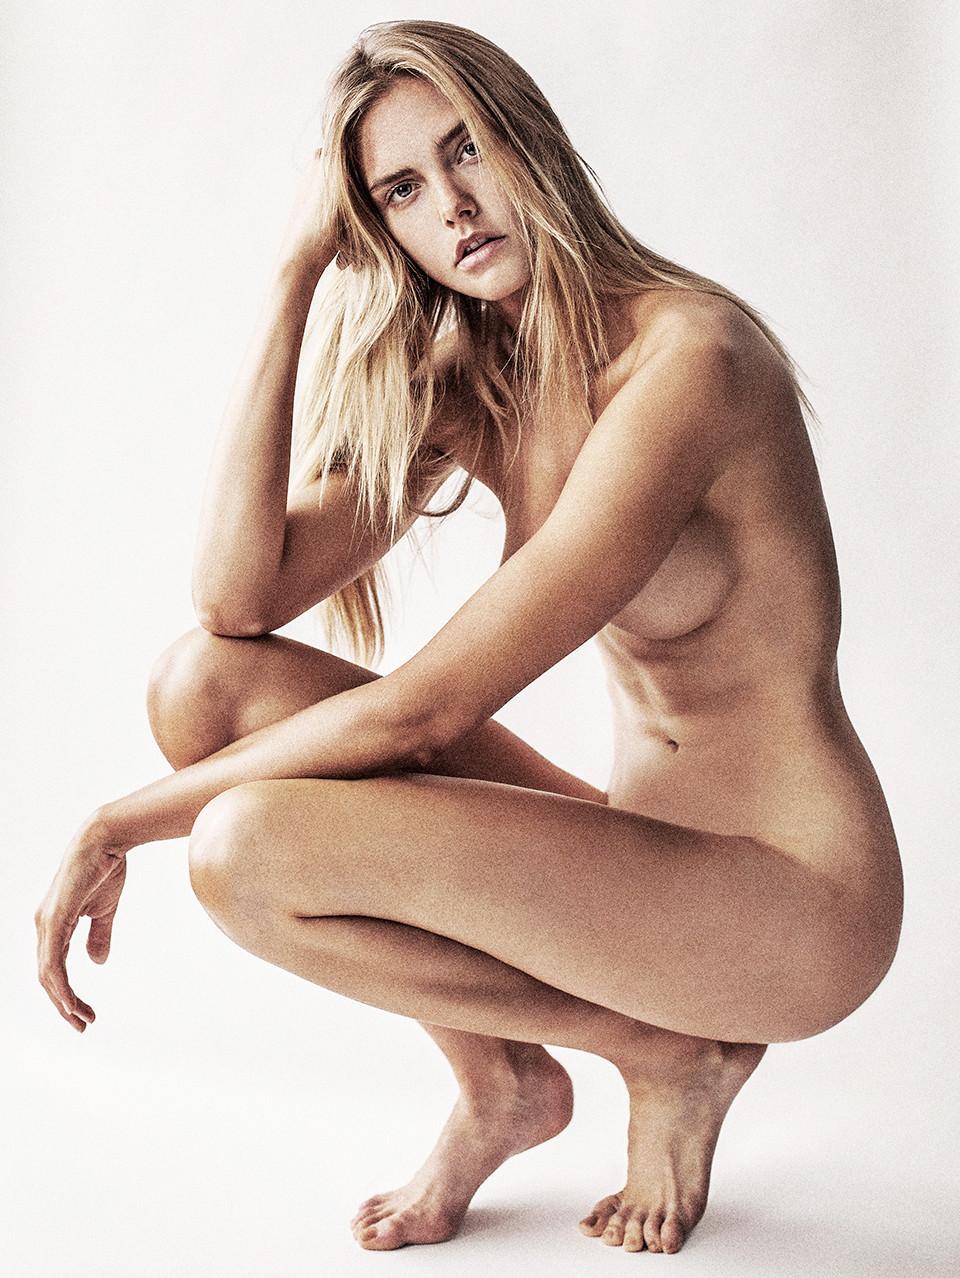 Milf skinny nude